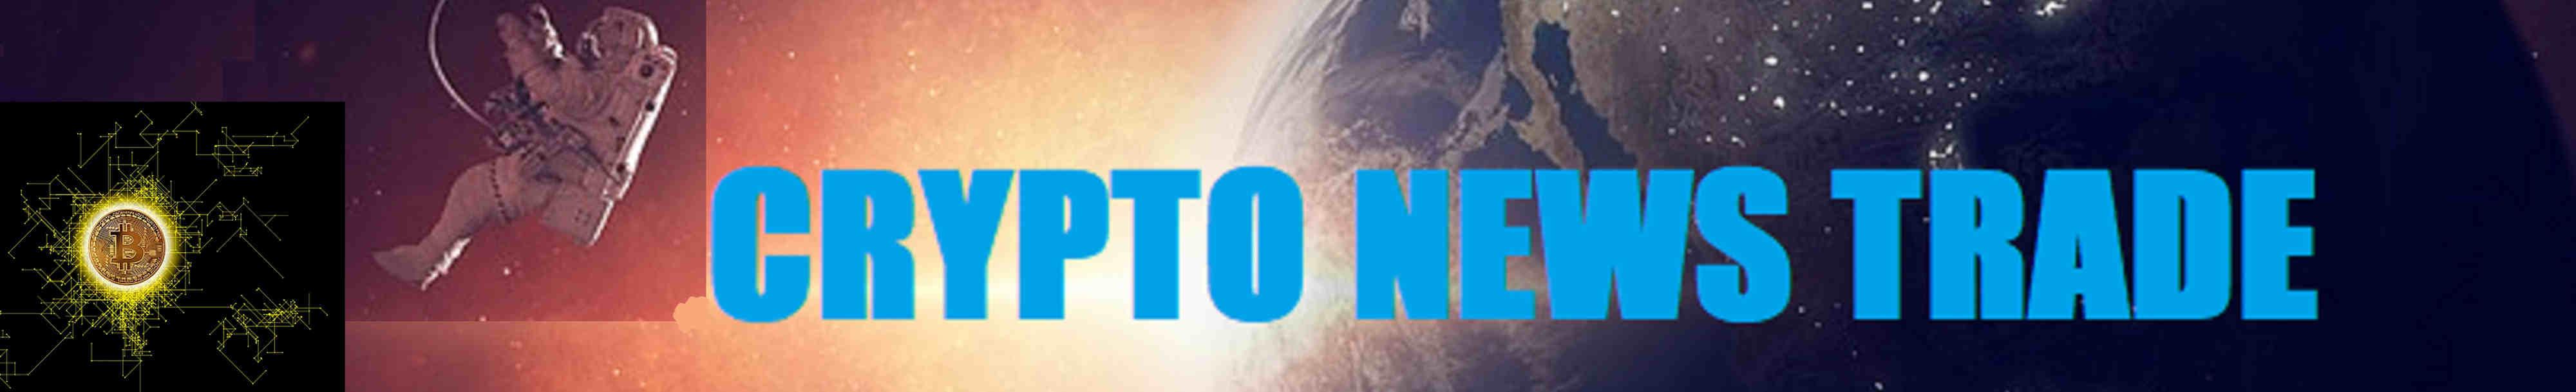 Crypto News Trade